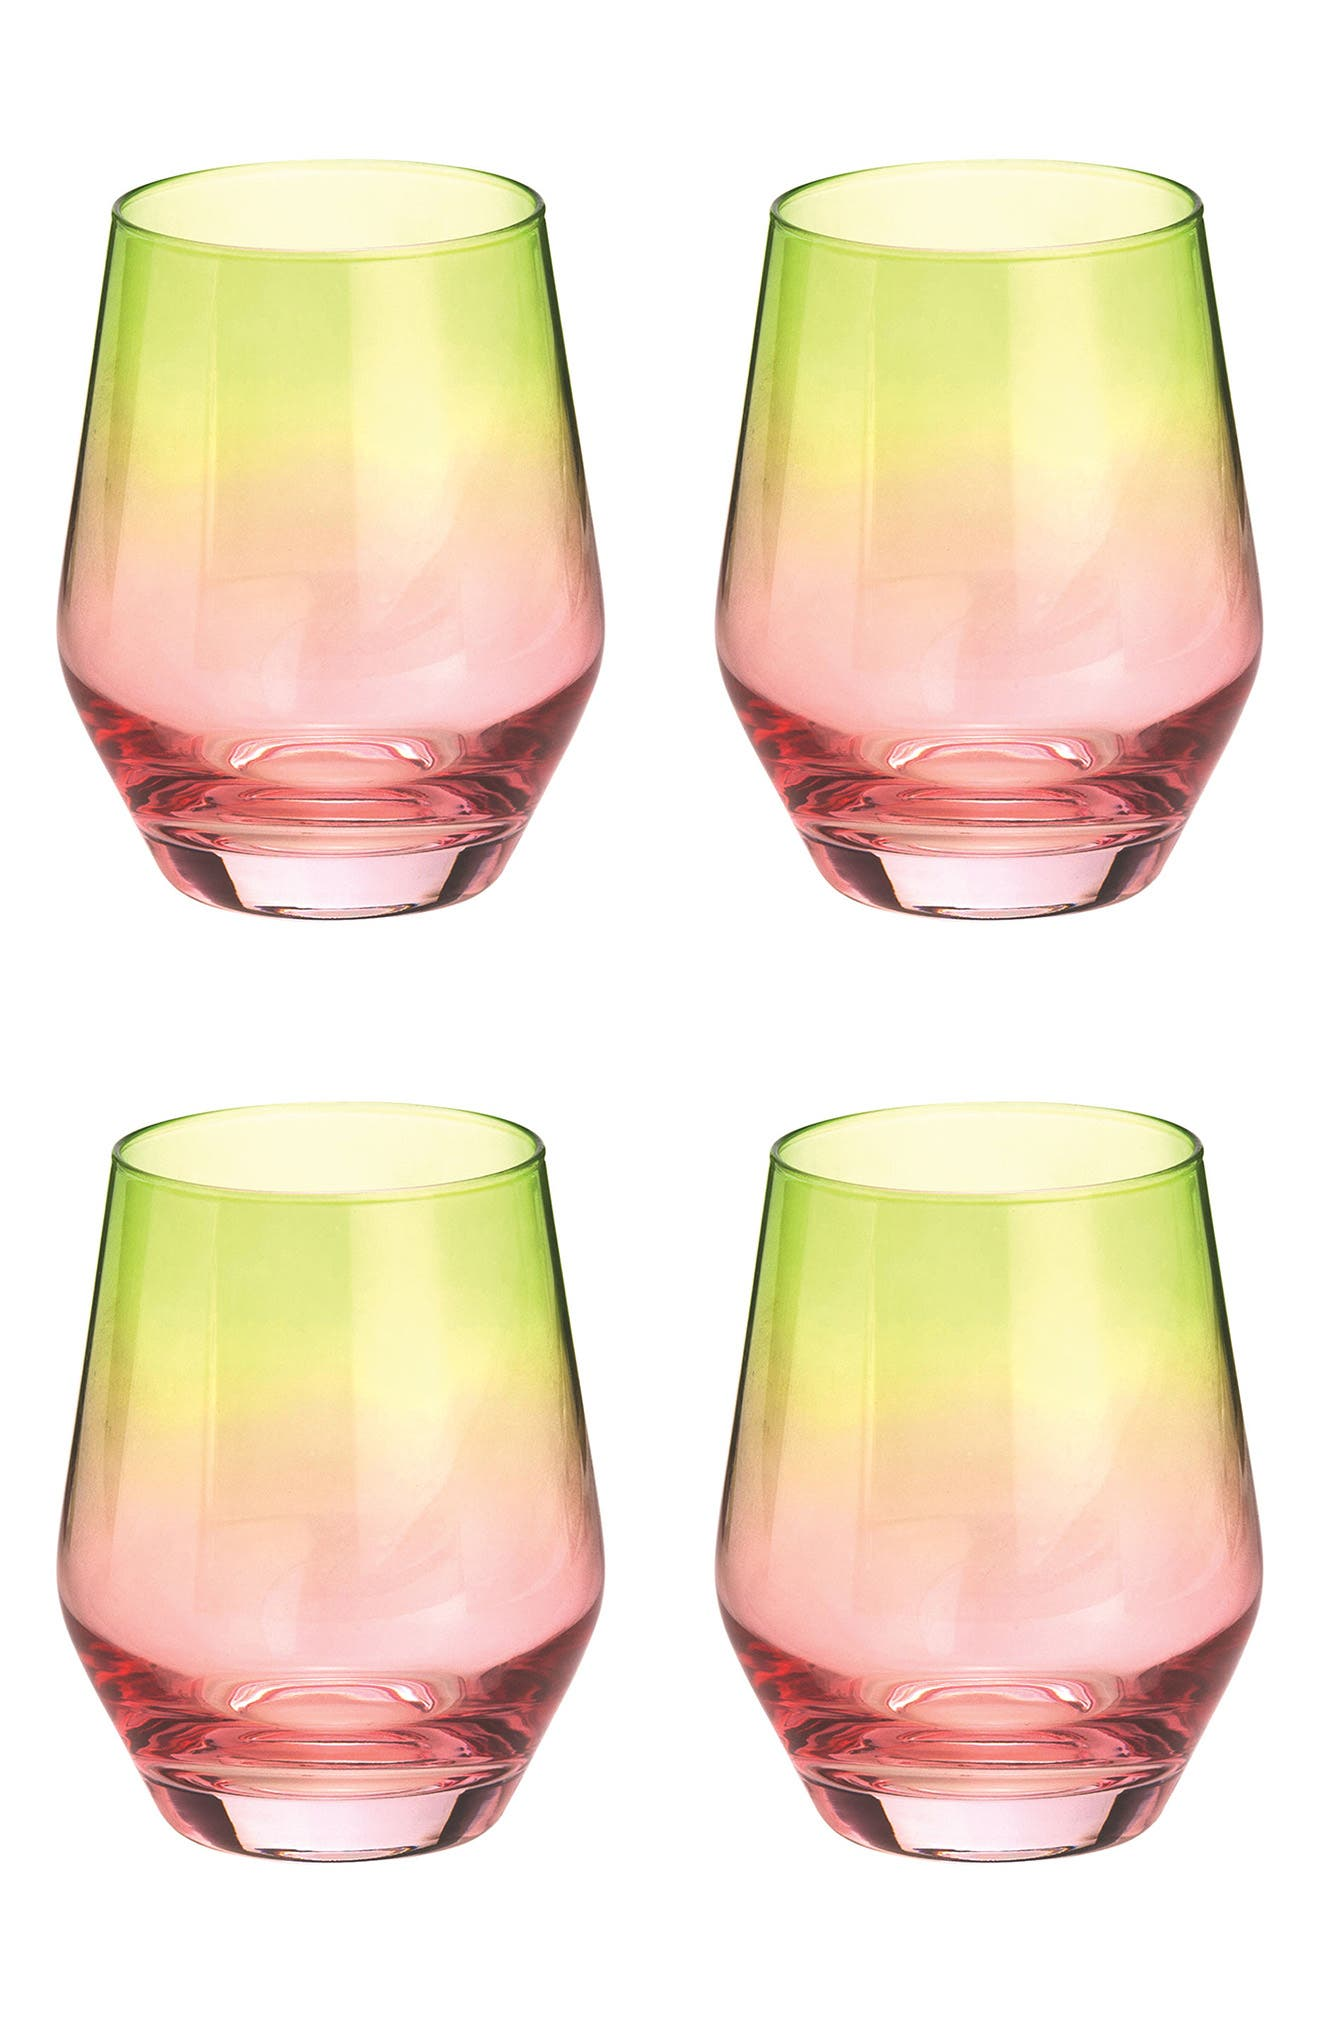 Main Image - Rosanna Zesty Life Set of 4 Highball Glasses